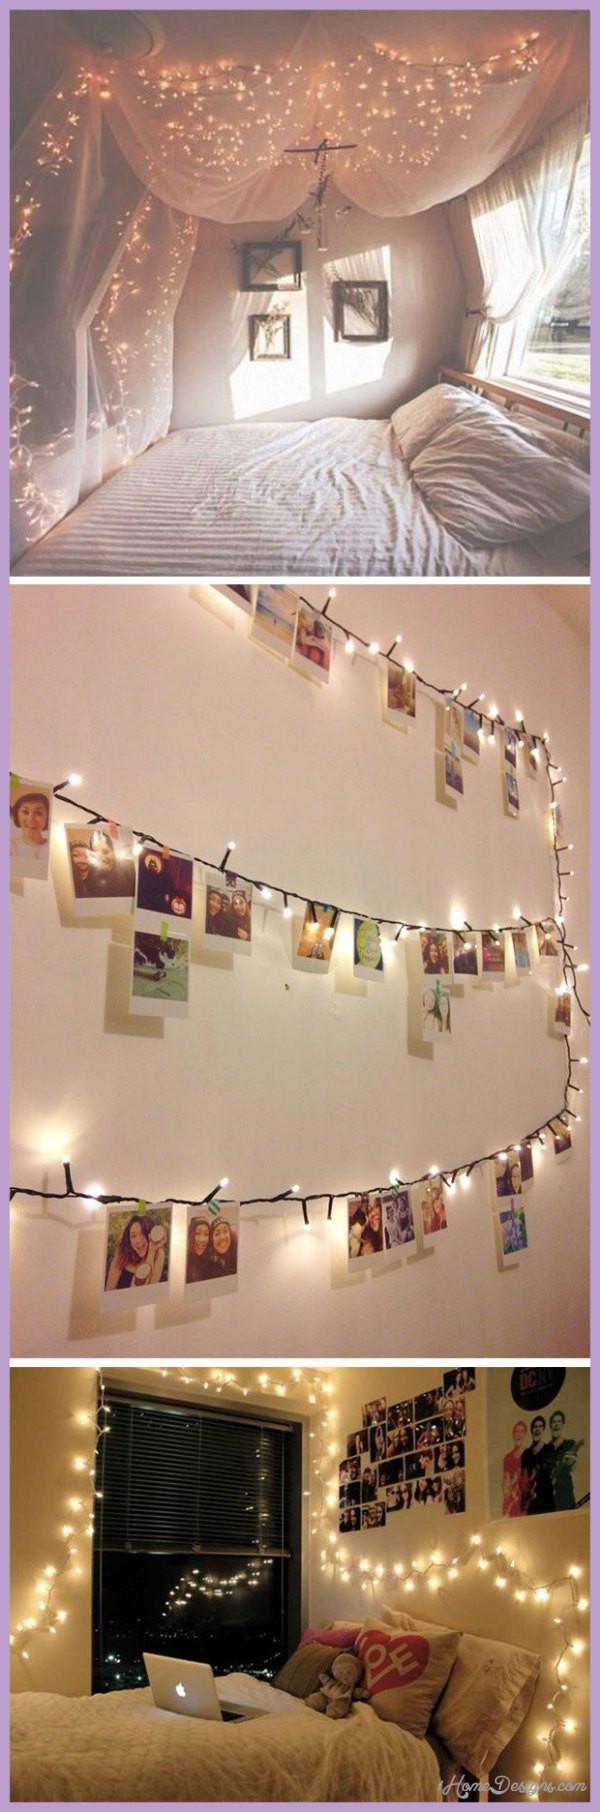 DIY Home Decorating Pinterest  Pinterest Home Decor Ideas Diy 1HomeDesigns